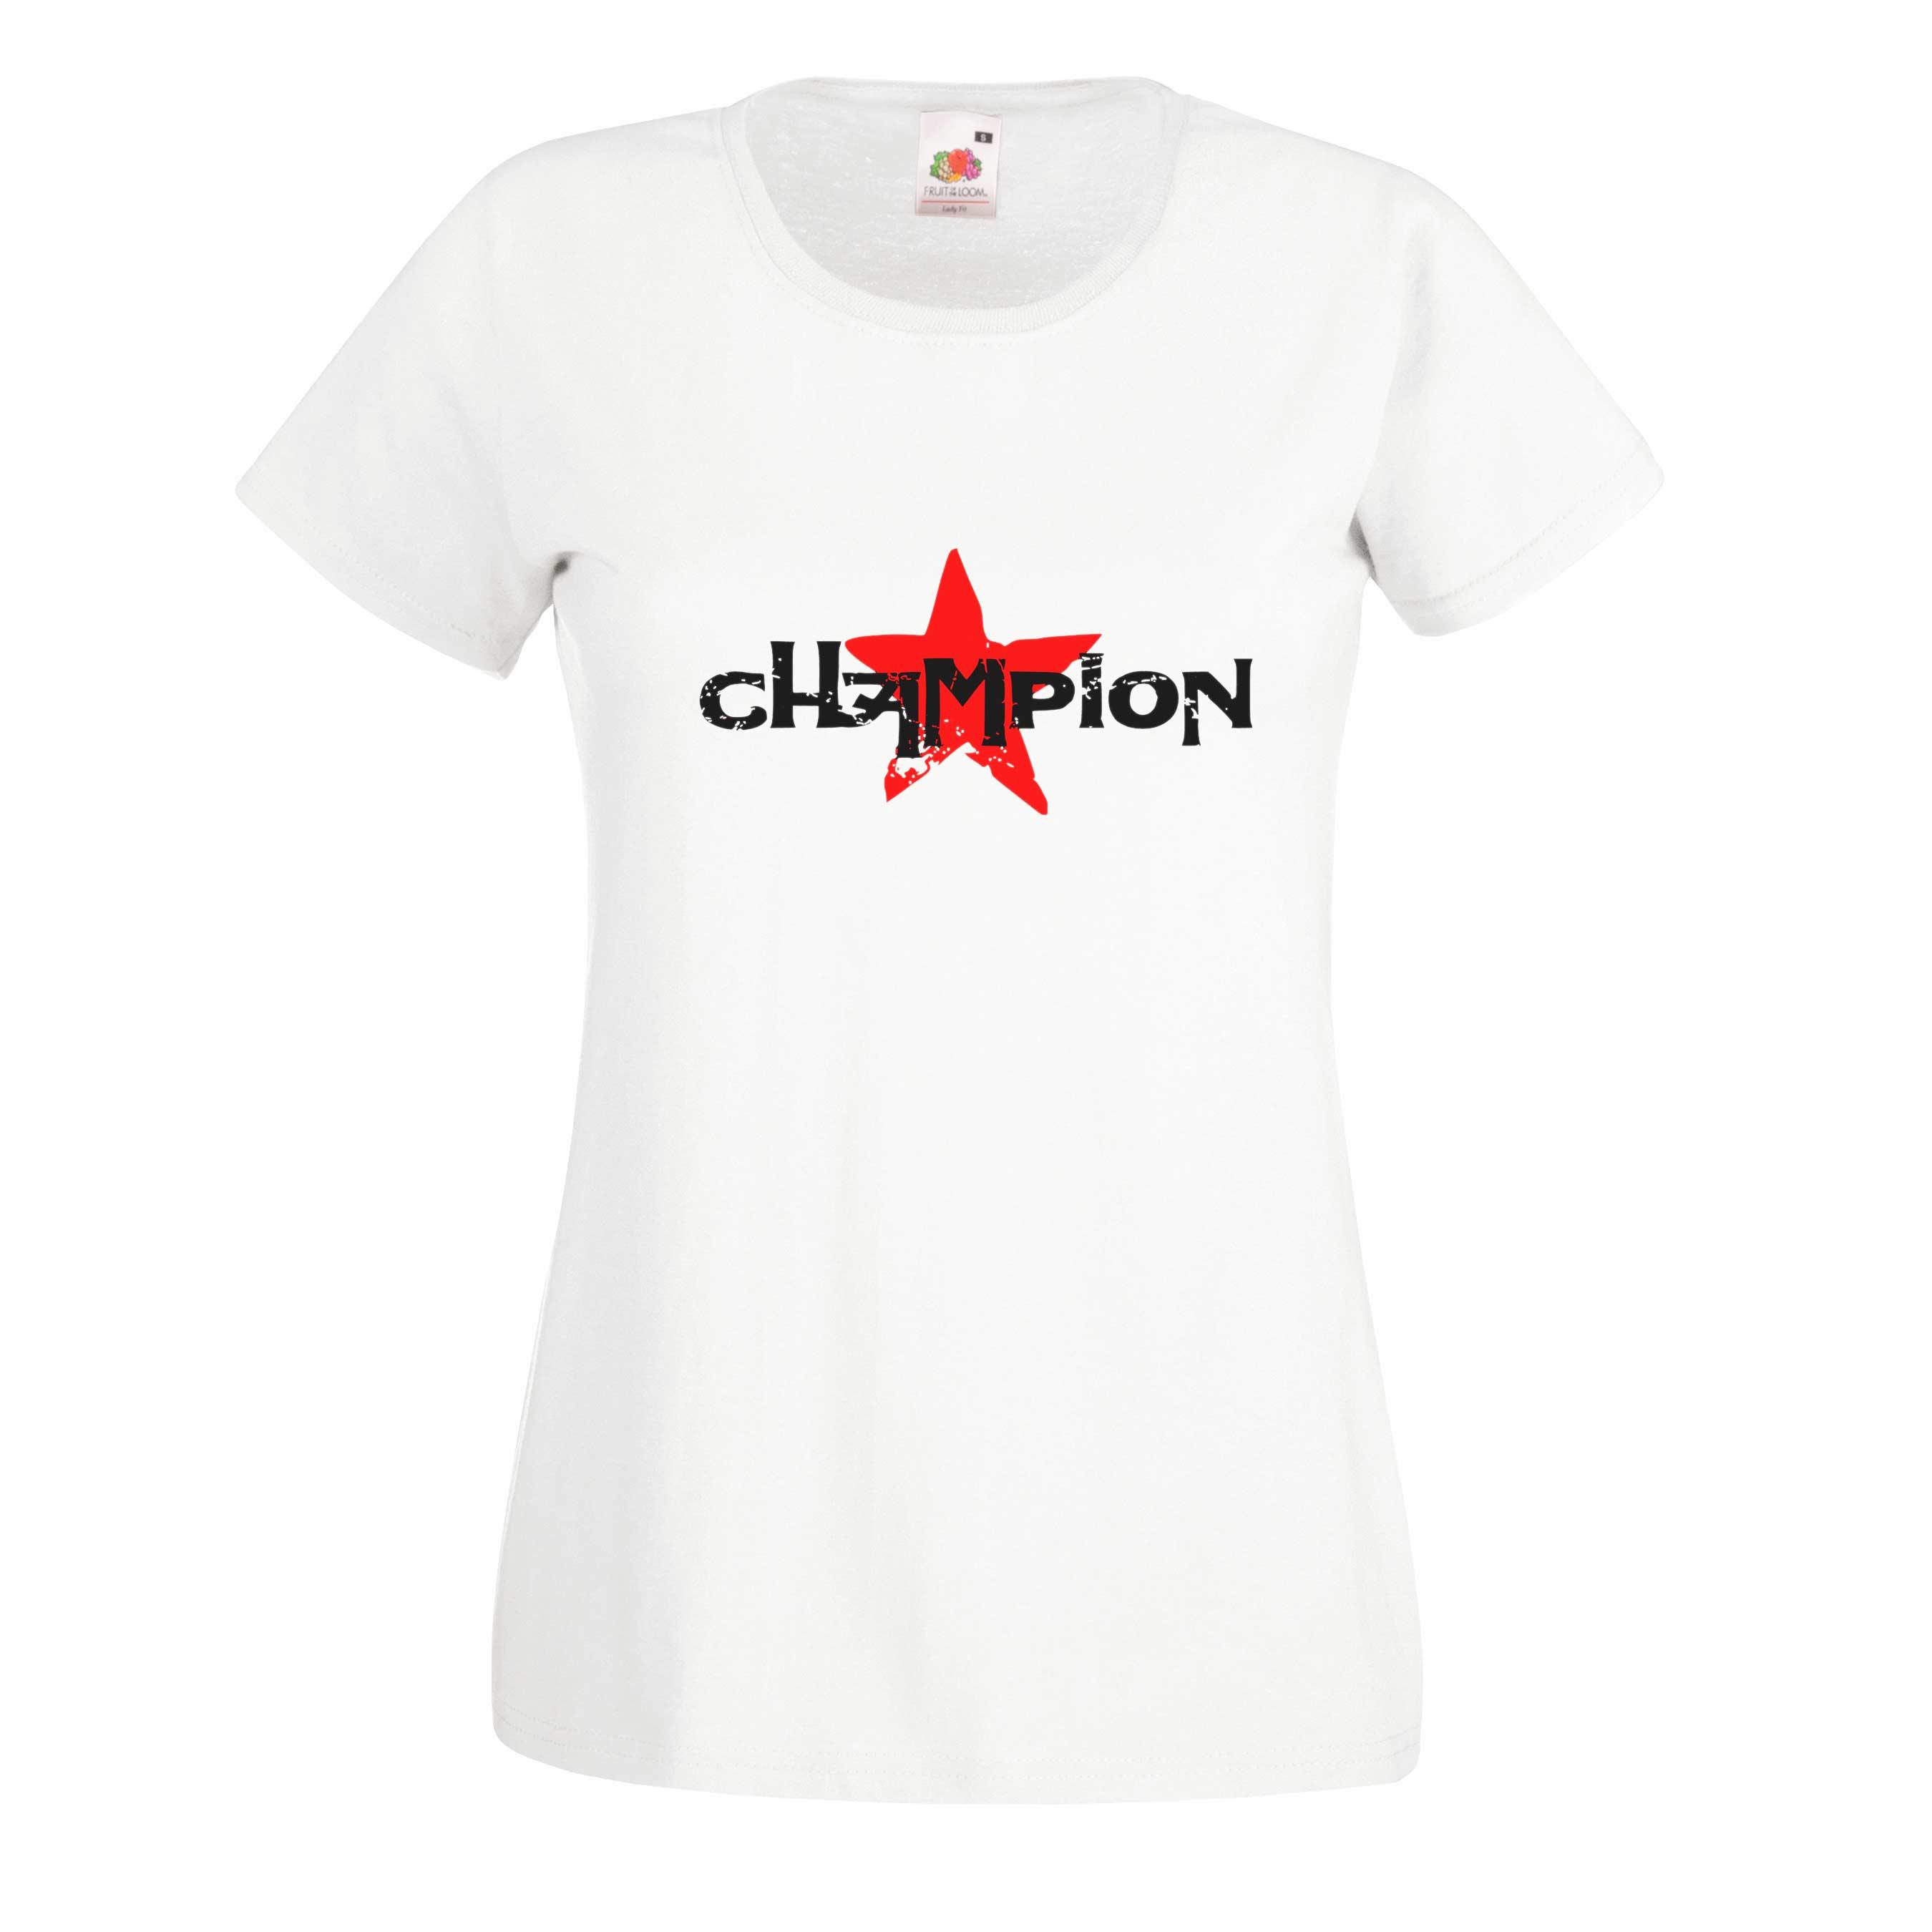 Champion design for t-shirt, hoodie & sweatshirt